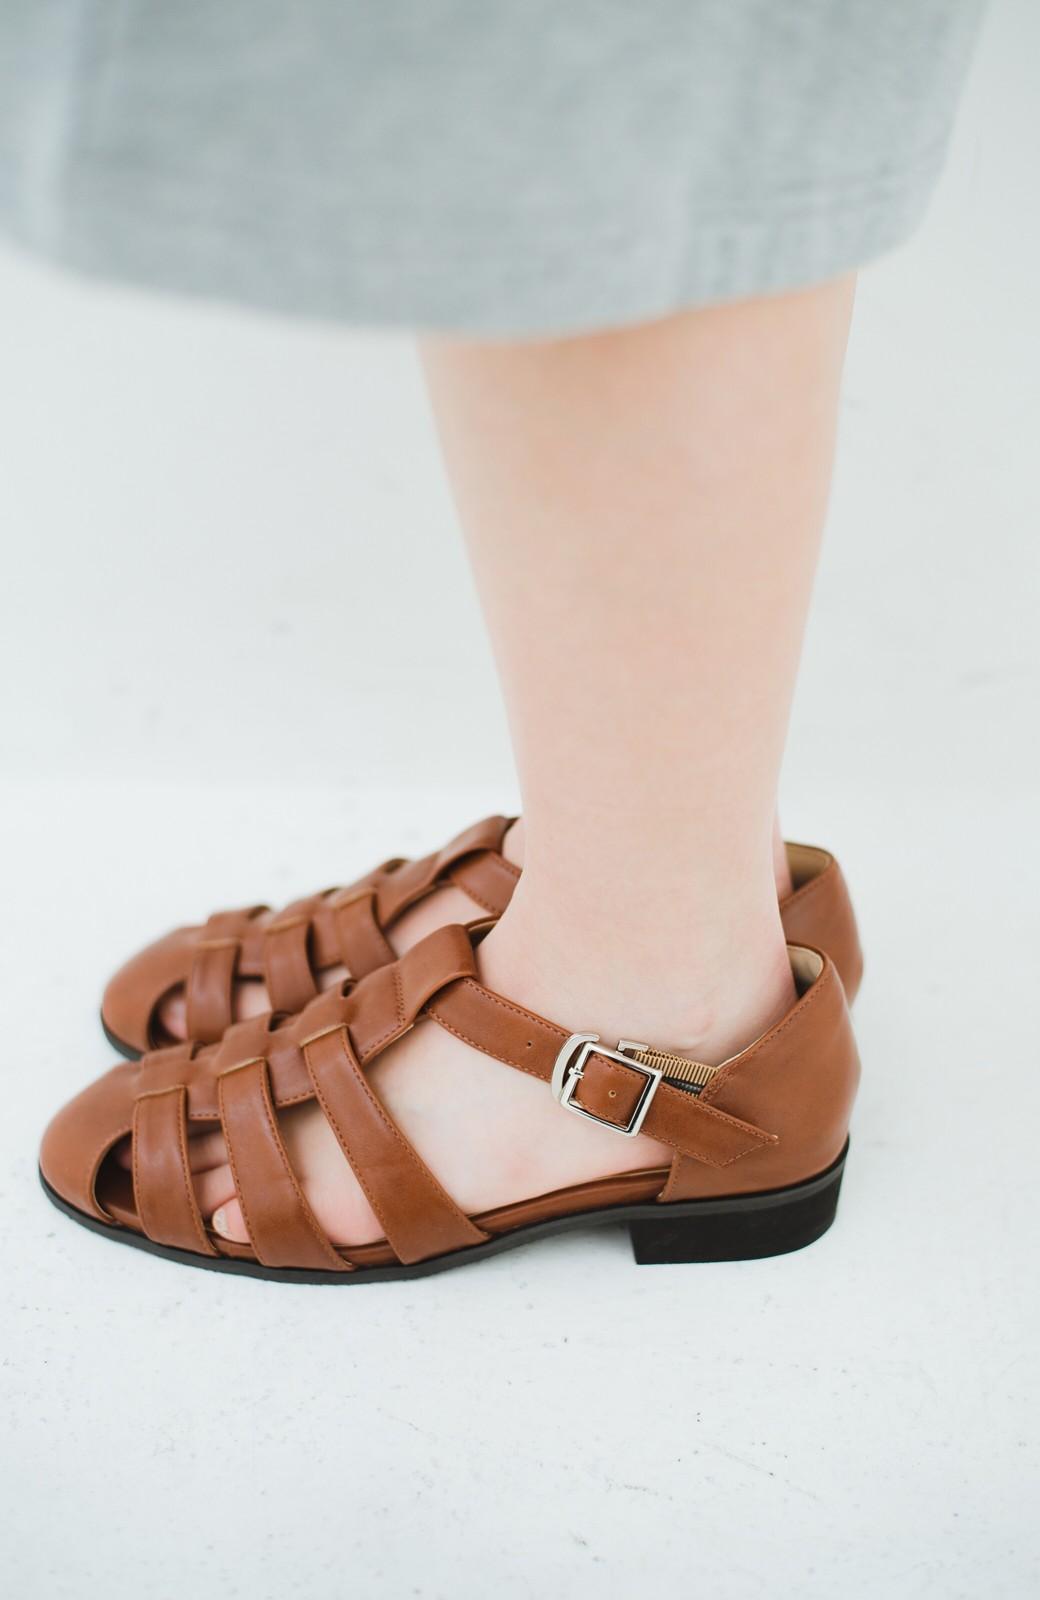 haco! 靴下でも素足でも合う 本革風編み込みサンダル <ブラウン>の商品写真3